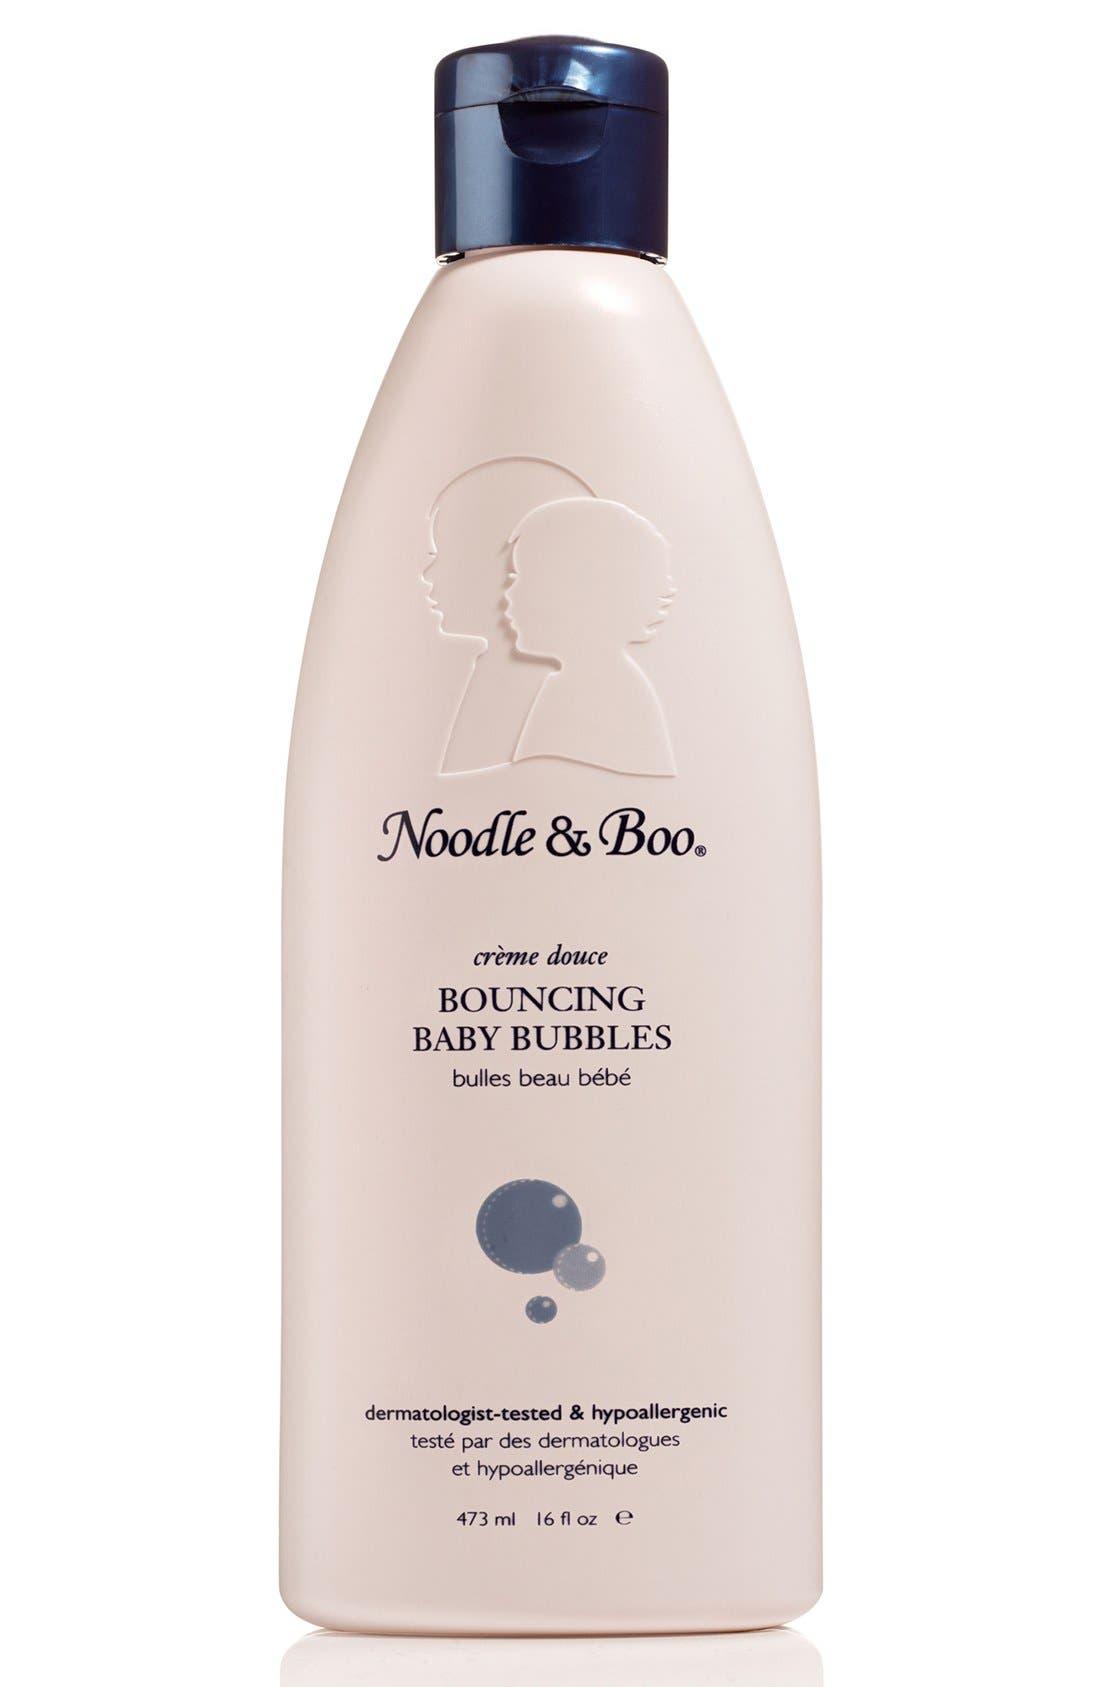 Noodle & Boo Bouncing Baby Bubble Bath